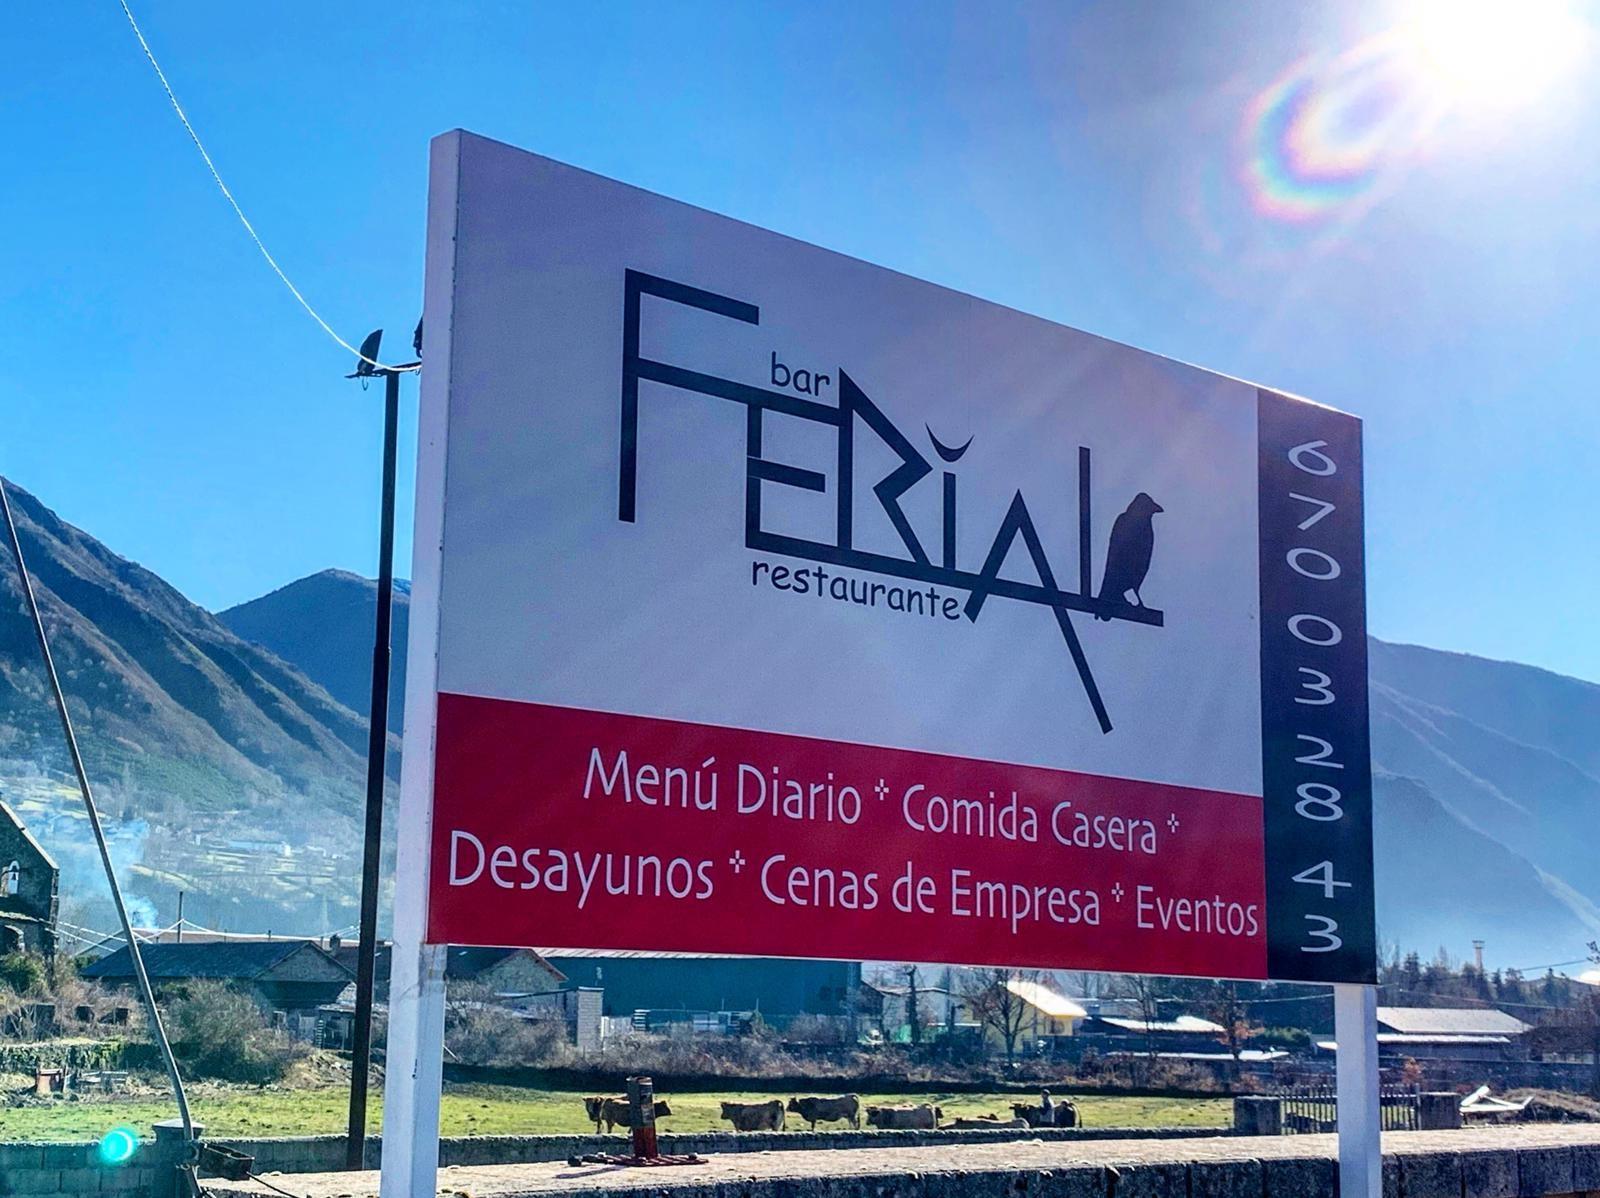 Bar-Restaurante El Ferial